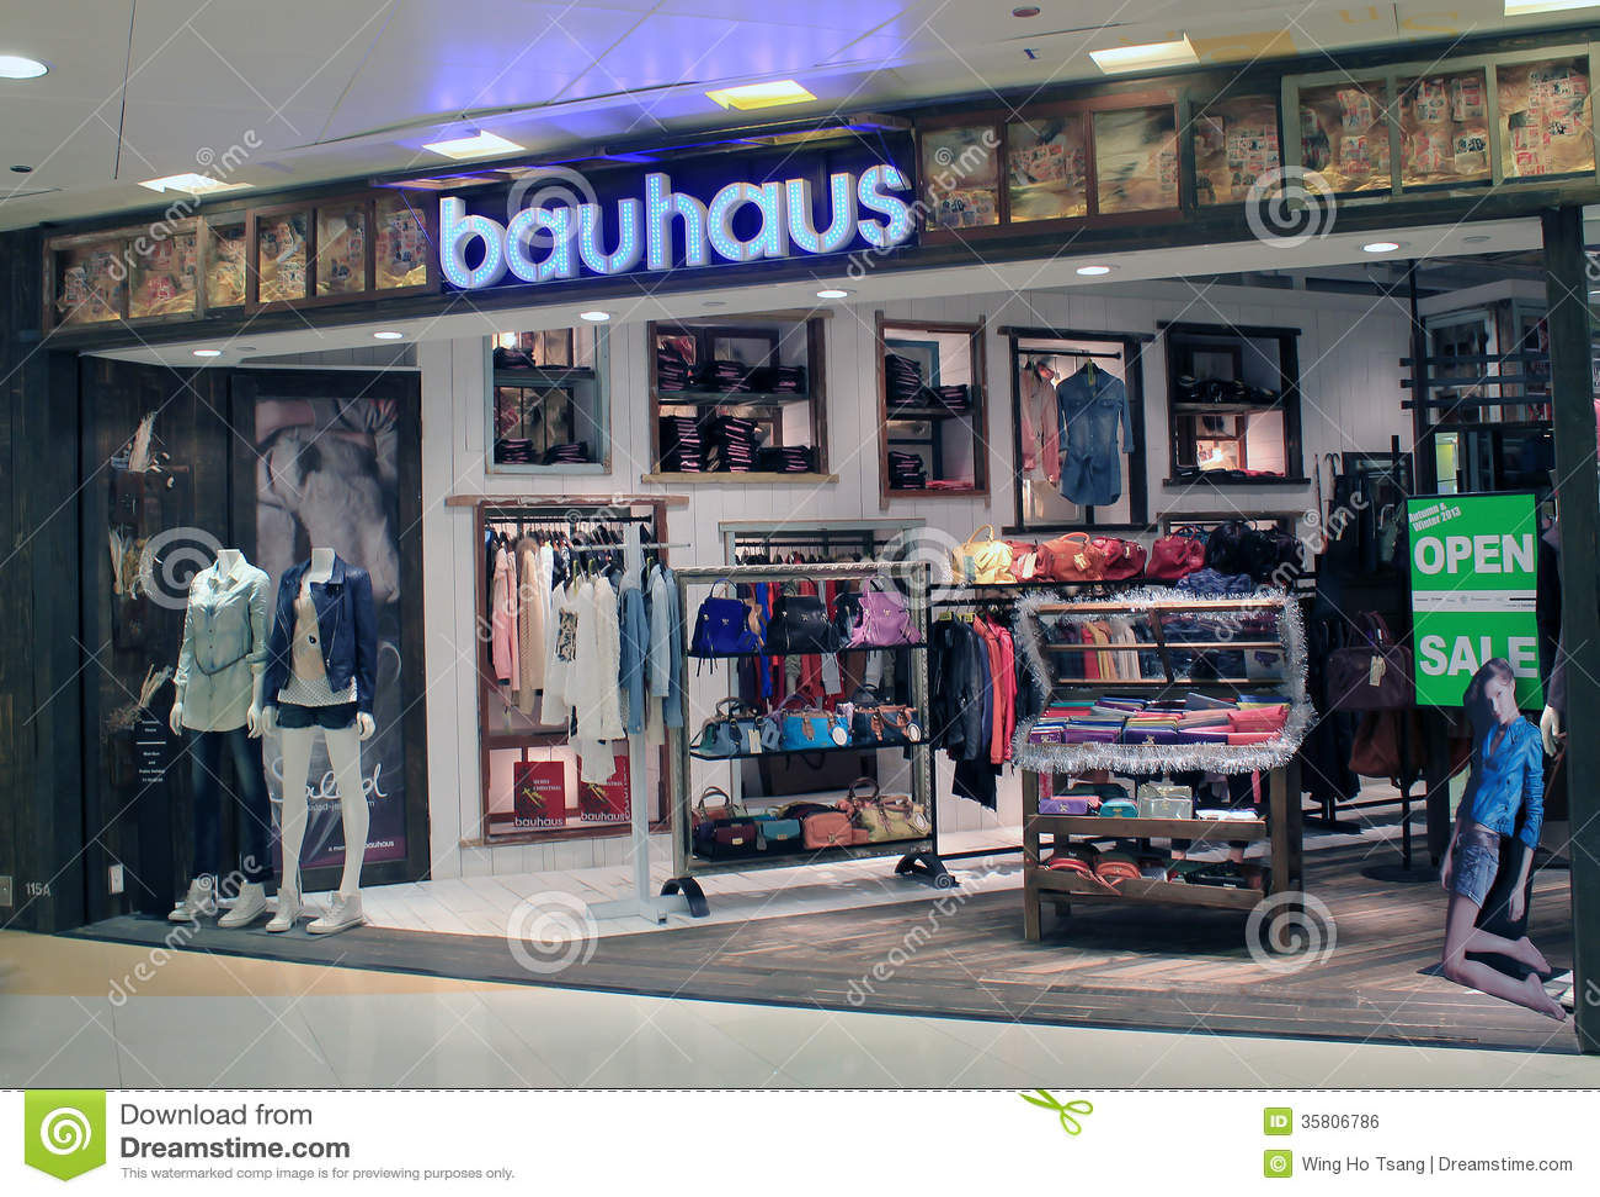 bauhaus shop in hong kong editorial photo image 35806786. Black Bedroom Furniture Sets. Home Design Ideas